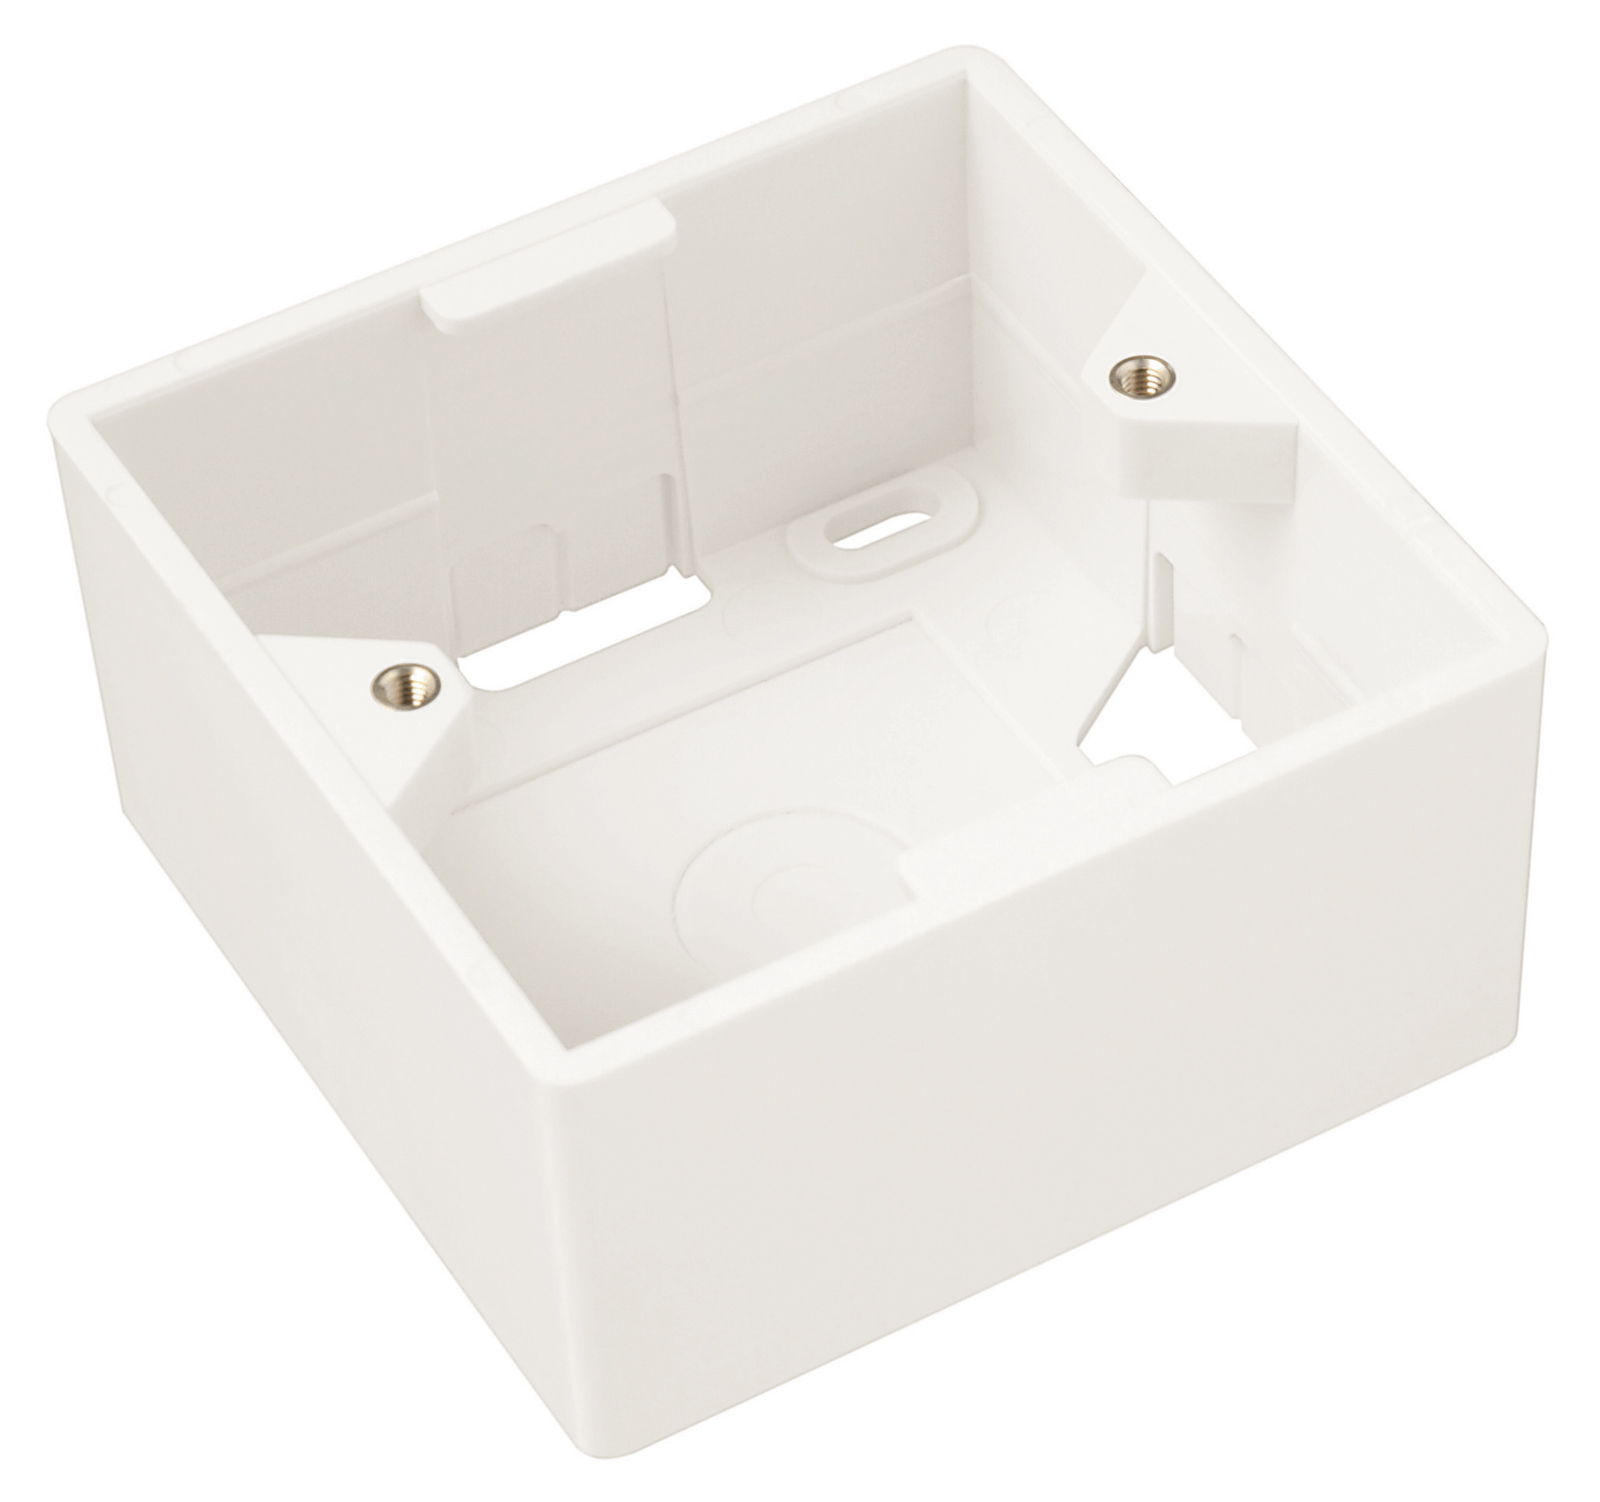 Box na omítku pro zásuvku SX9 bílý 80 x 80 x 32mm